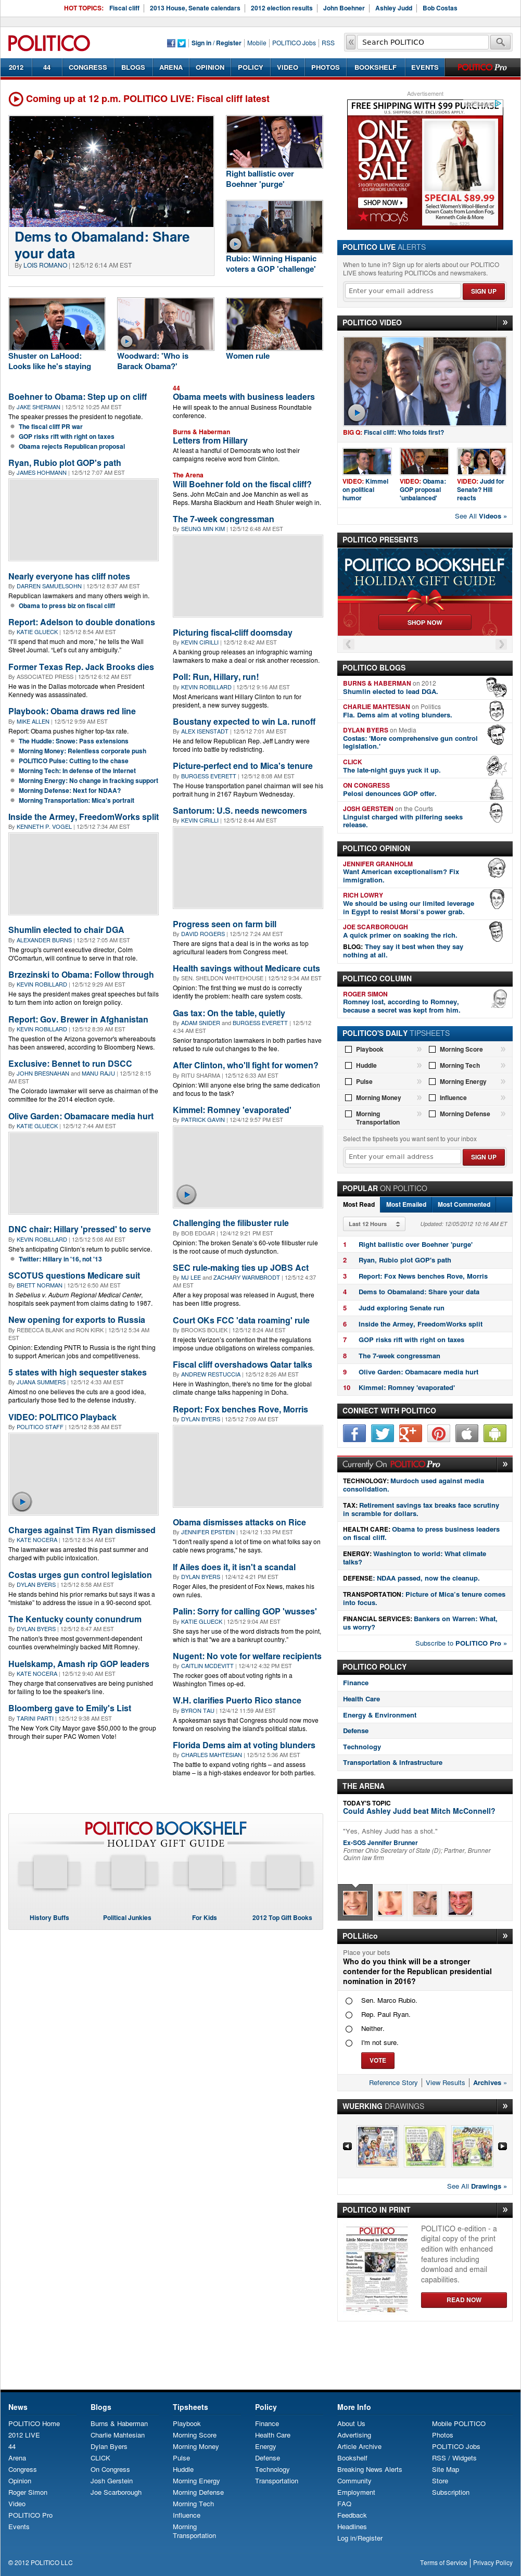 Politico at Wednesday Dec. 5, 2012, 3:36 p.m. UTC